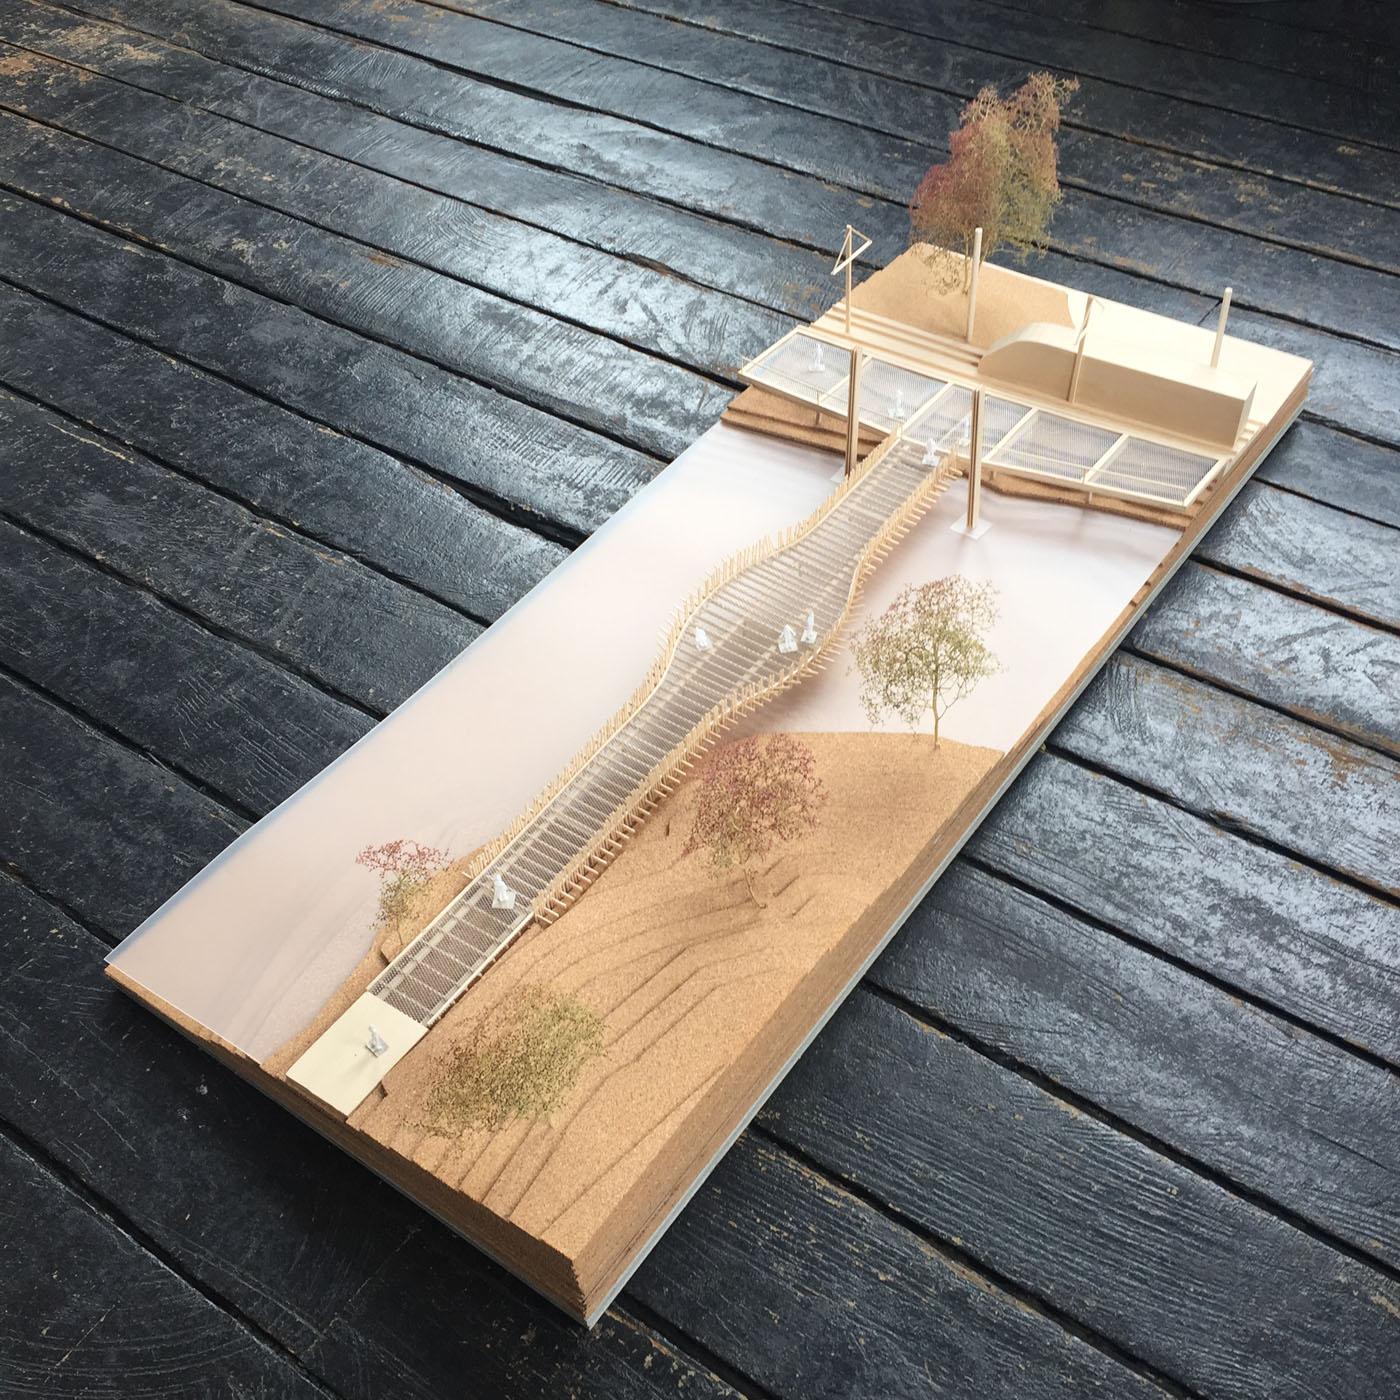 Alison Road Bridge by Sydney award winning architecture office Sam Crawford Architects. Balsa wood and metal mesh presentation model.